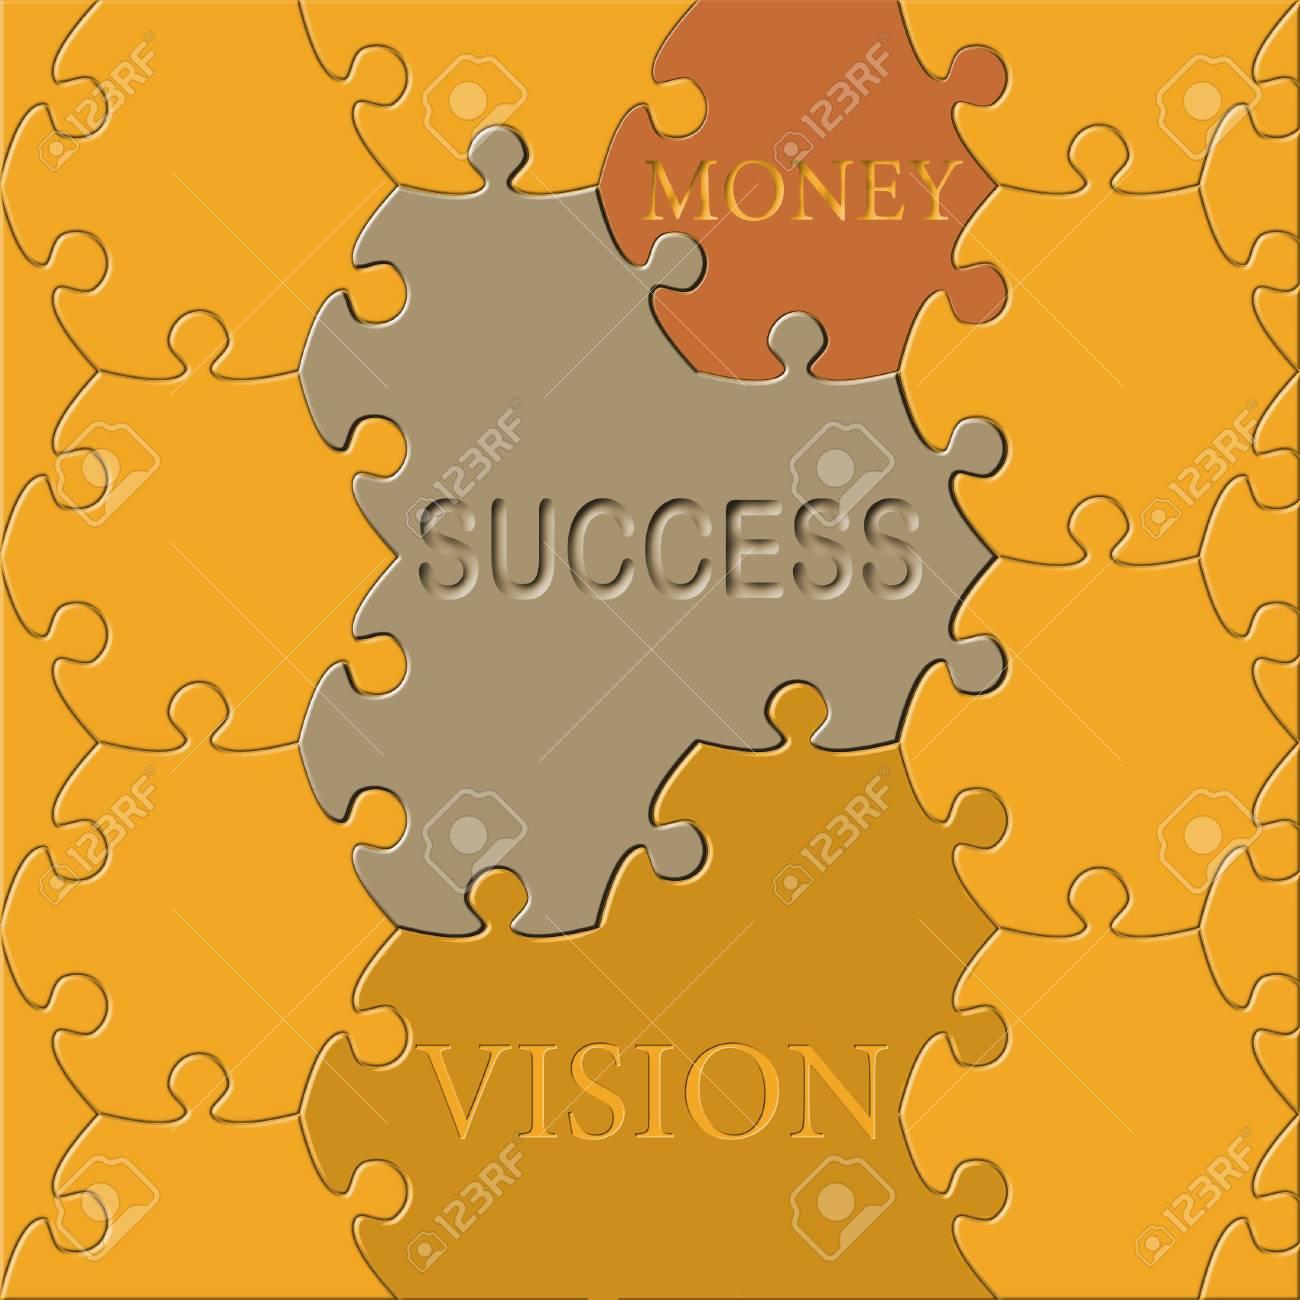 jigsaw puzzle success-money-vision Stock Photo - 19493443